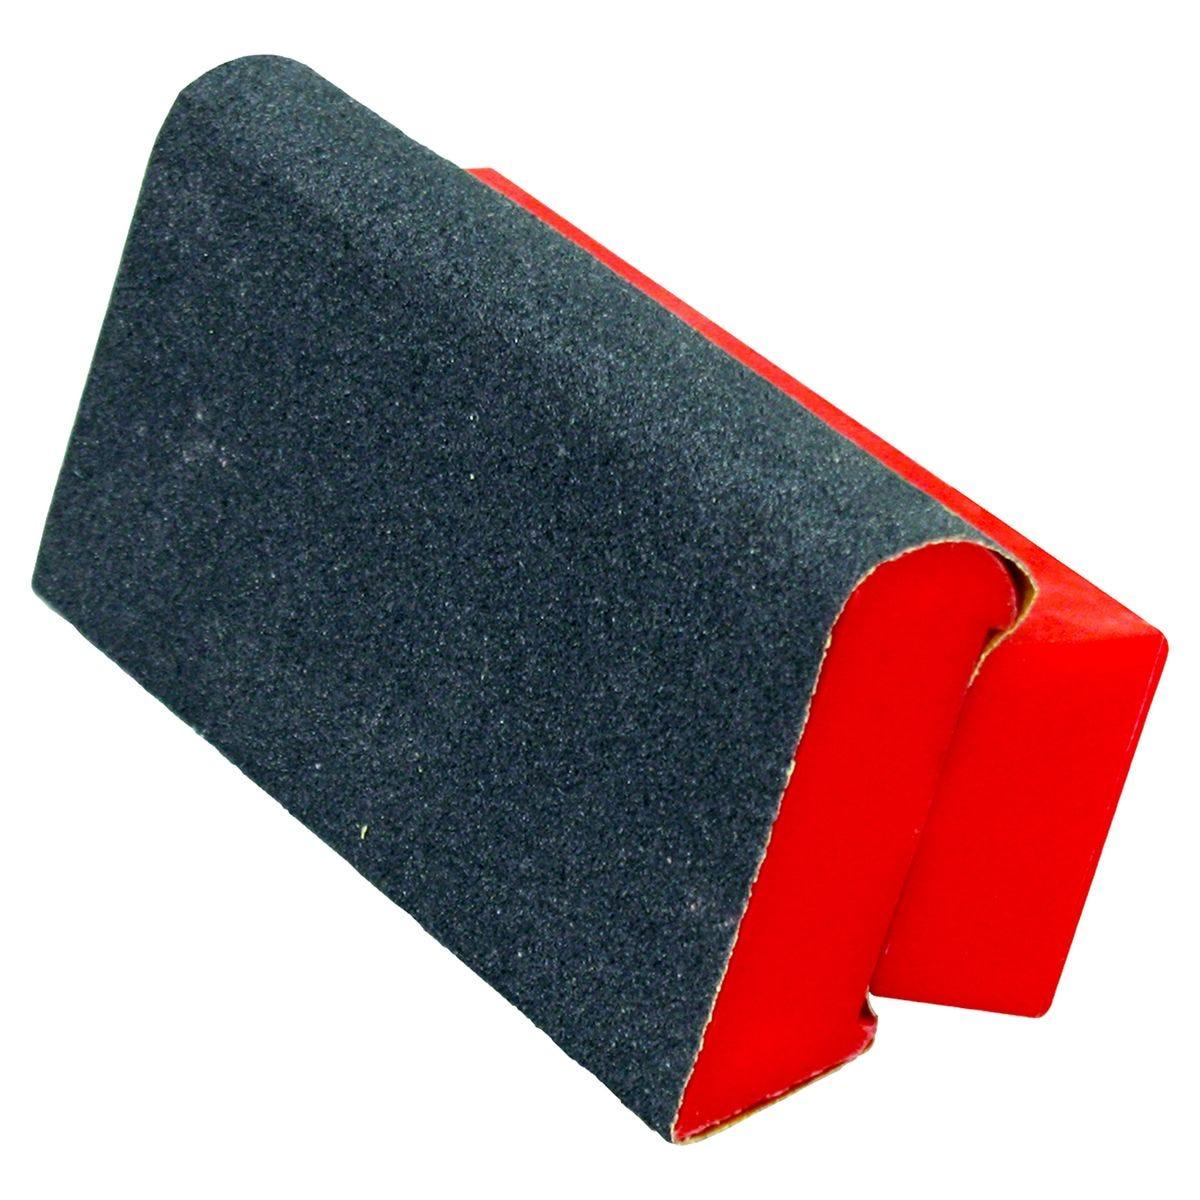 Rolson Sanding Block